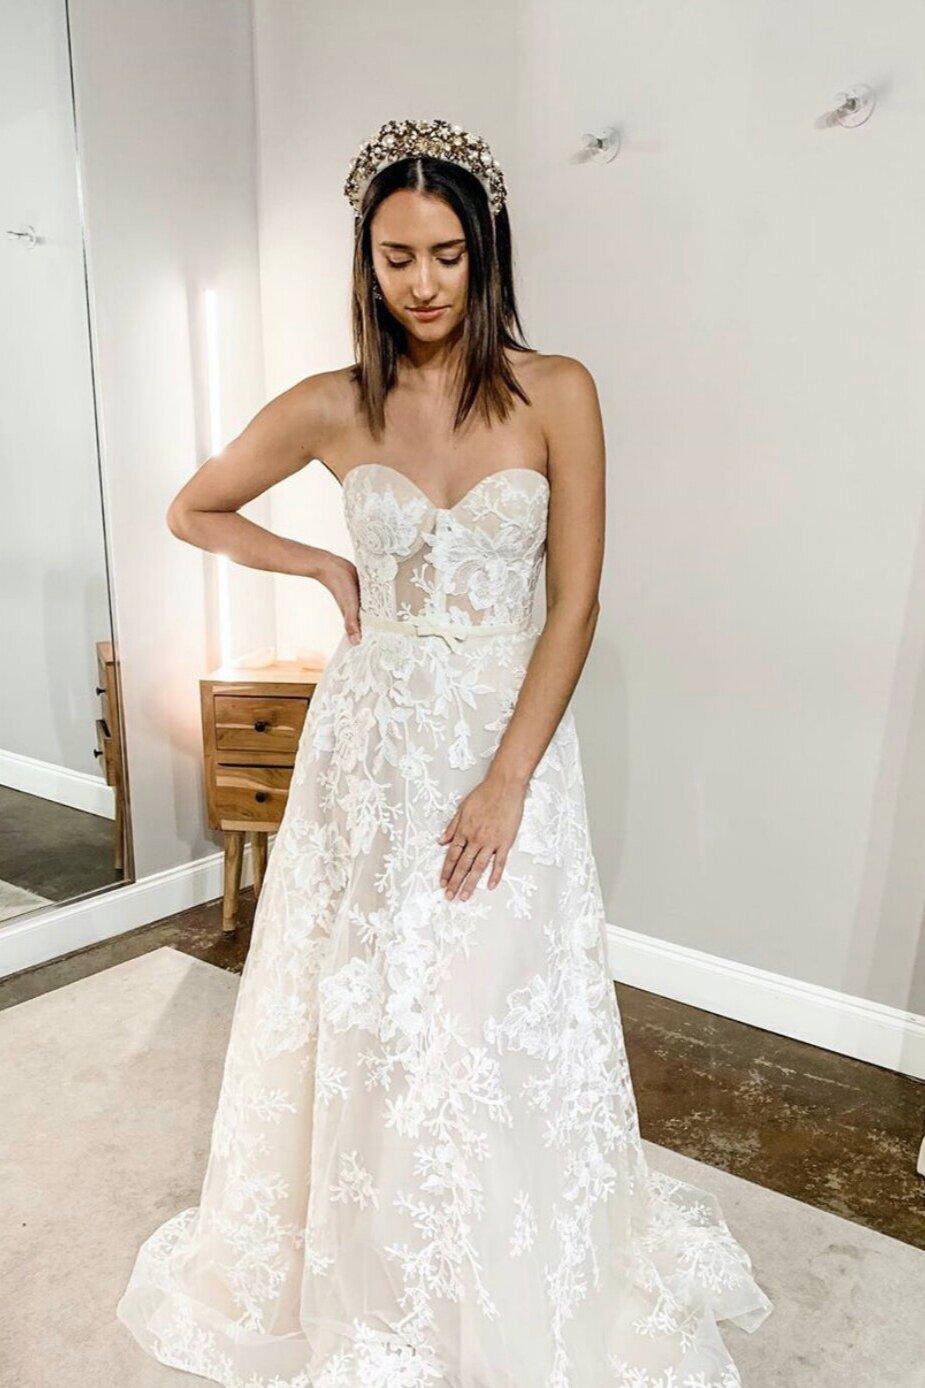 Berta Bridal Wedding Dress at Bridal Shop in Orlando